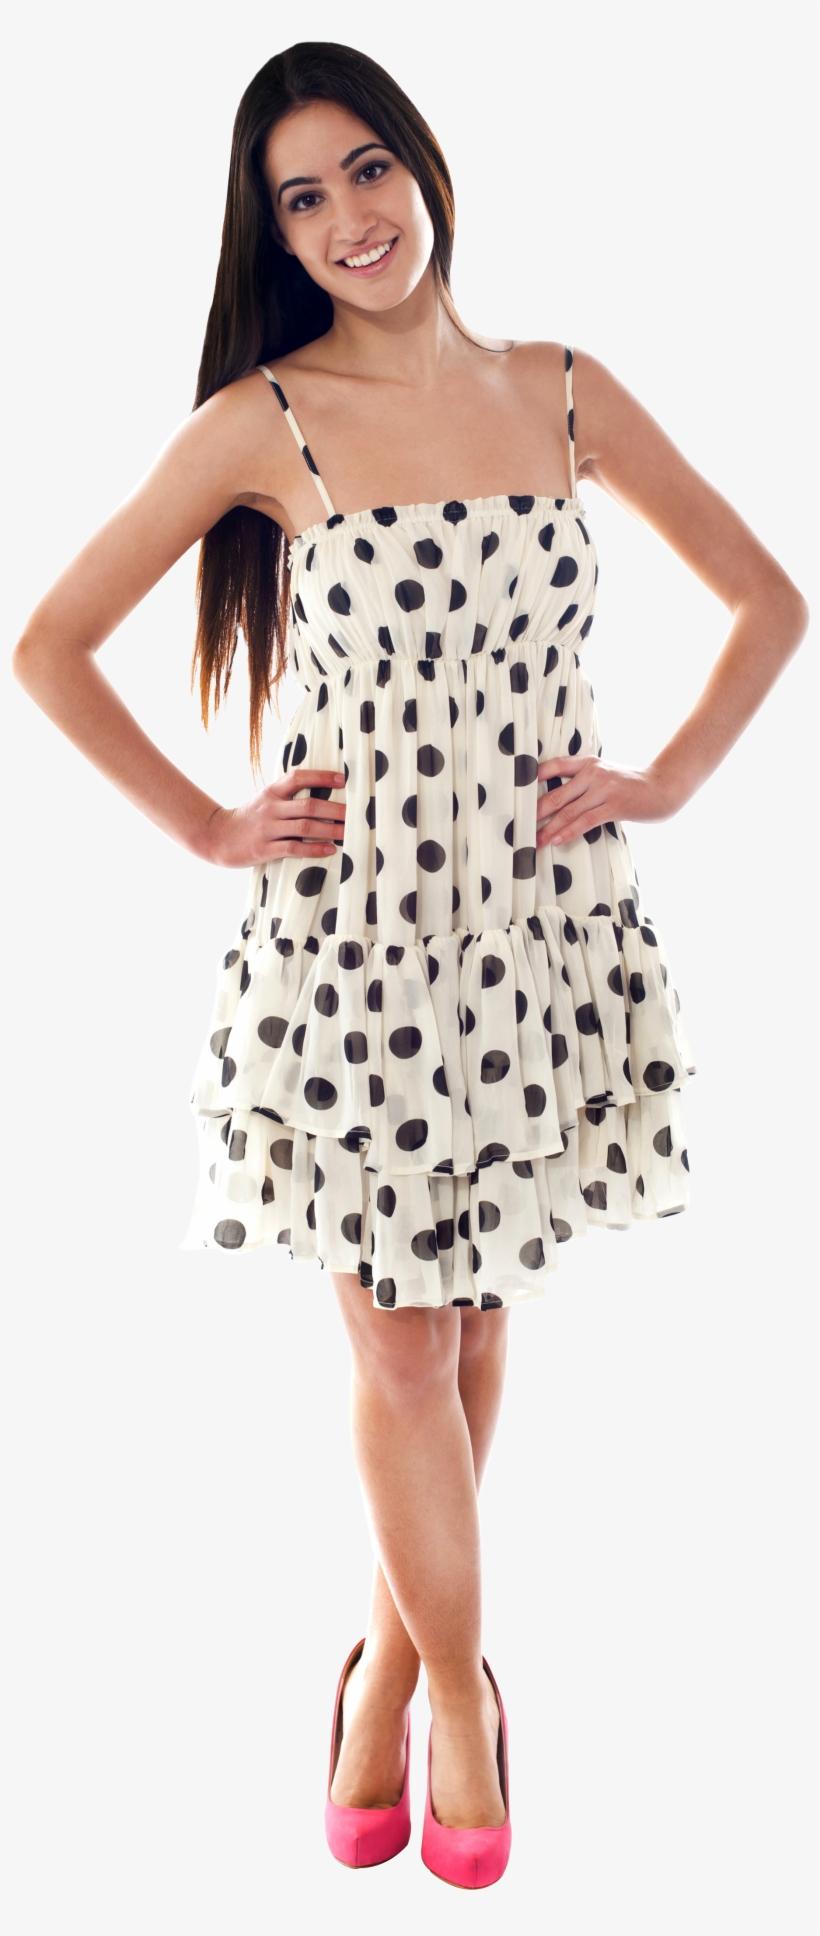 Fashion Girl Png Image.